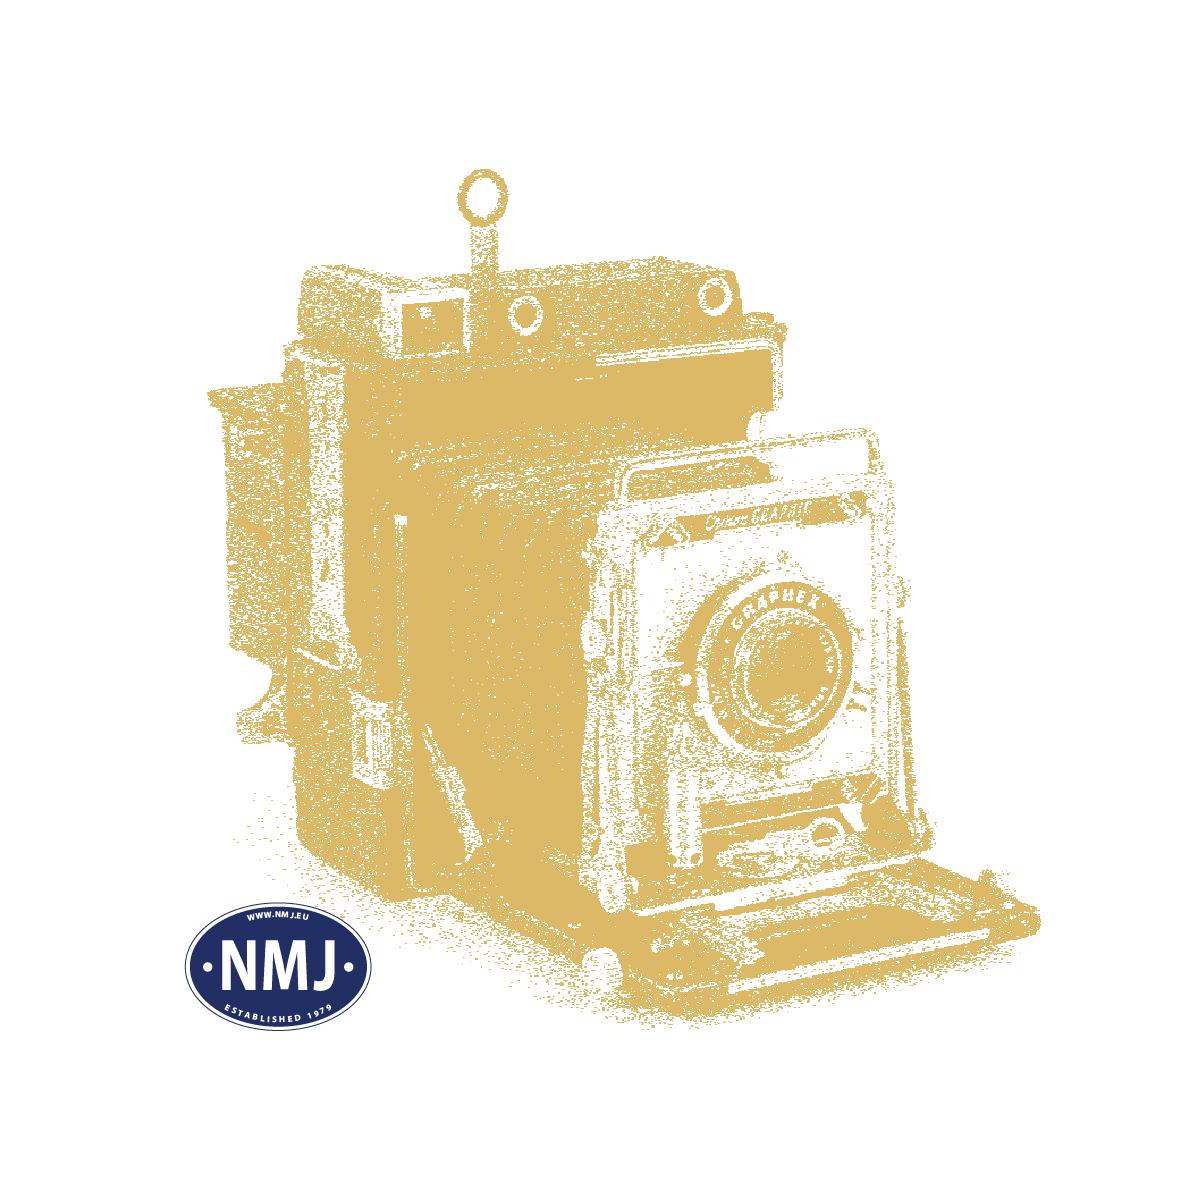 NMJT83.312 - NMJ Topline CargoNet Skd 224.218, Rød/gul, DCC Digital